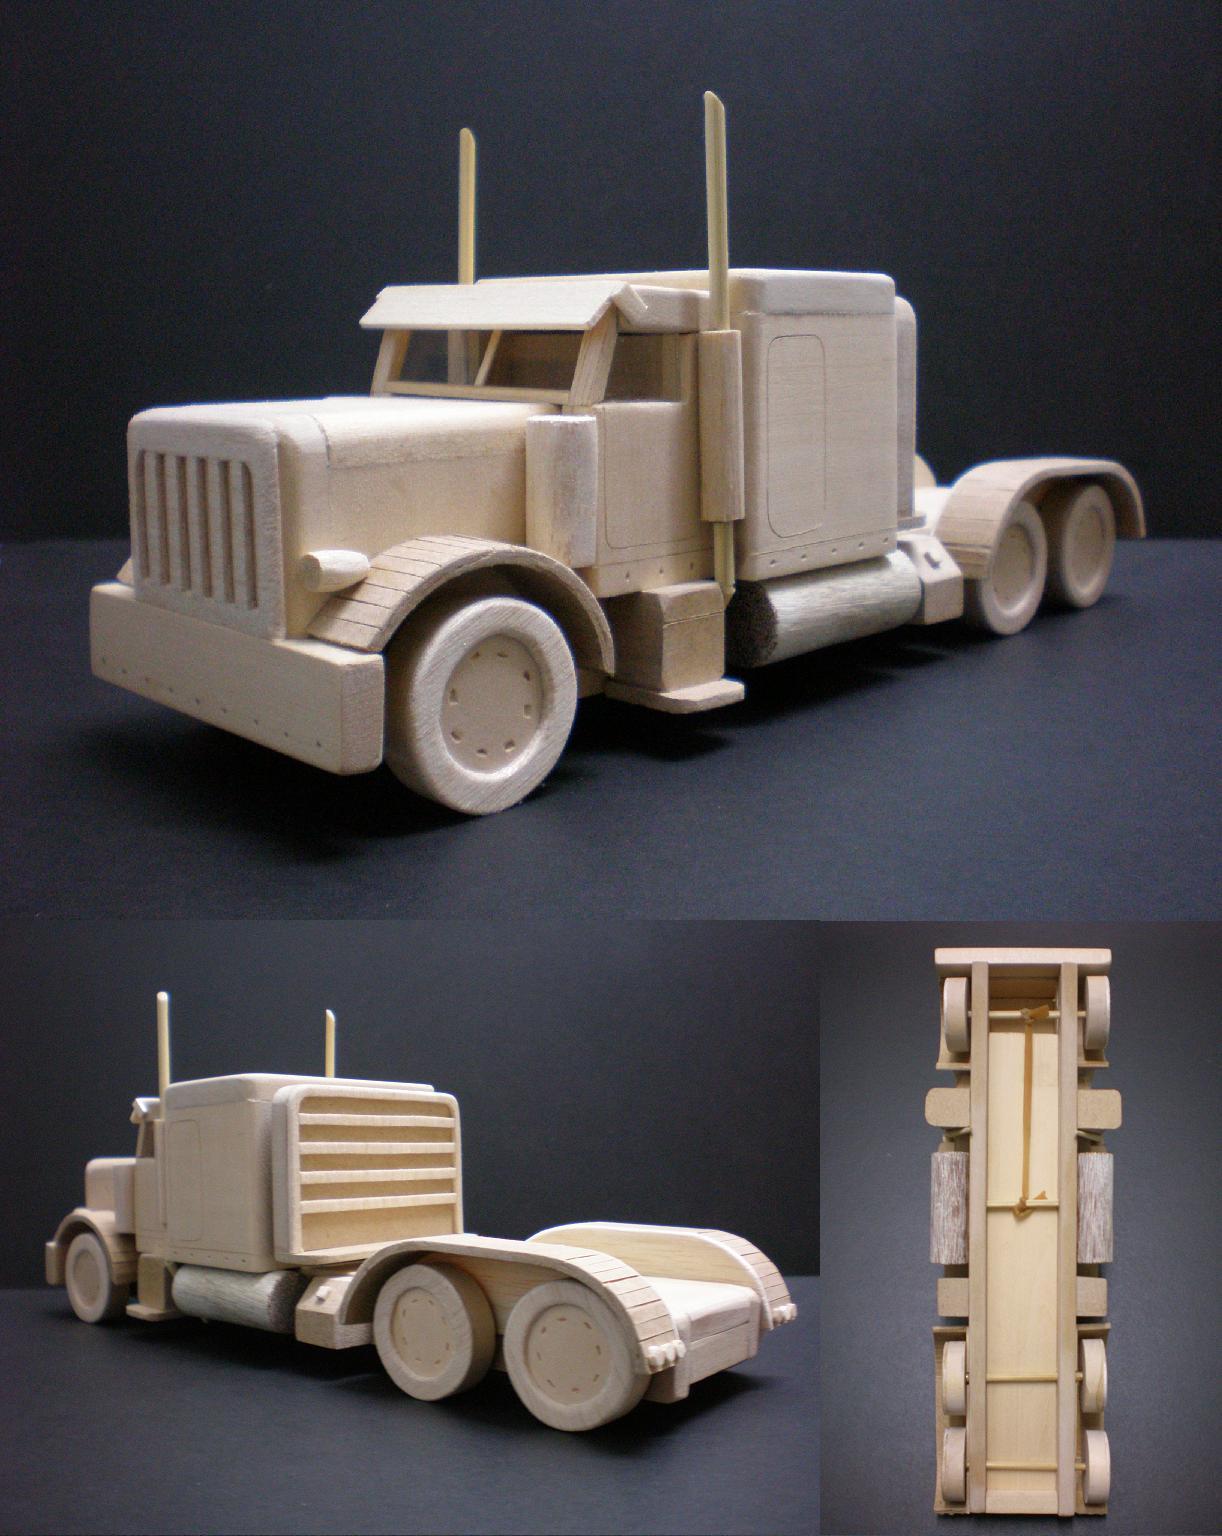 Optimus Prime Truck 2 by tkyzgallery on DeviantArt